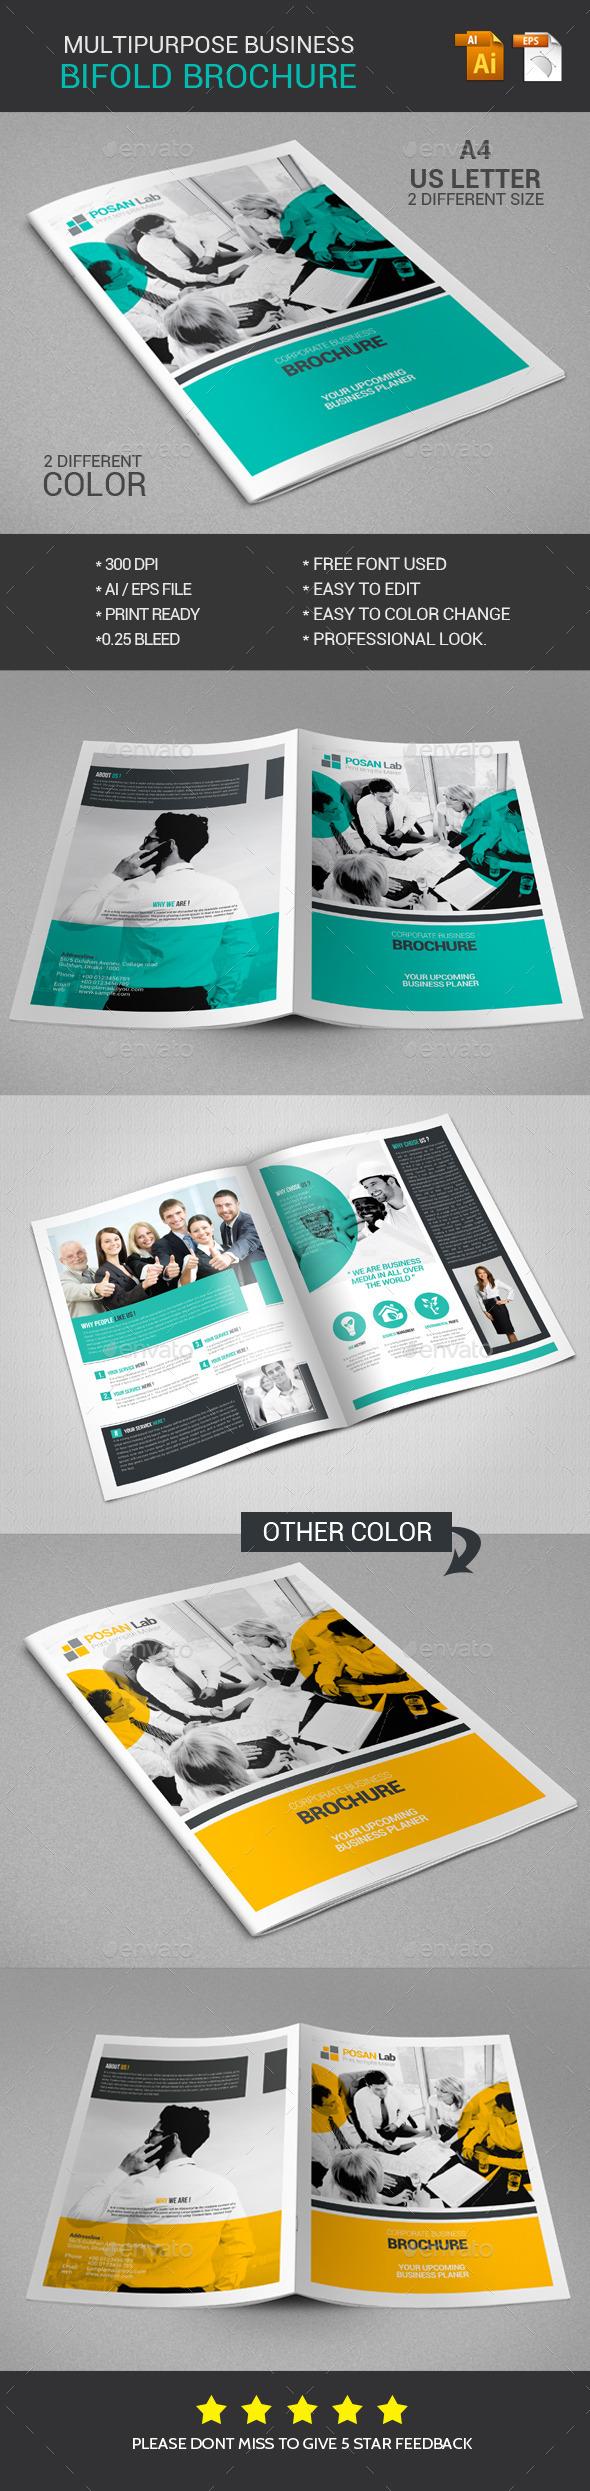 Bifold Brochure Multipurpose Business - Brochures Print Templates